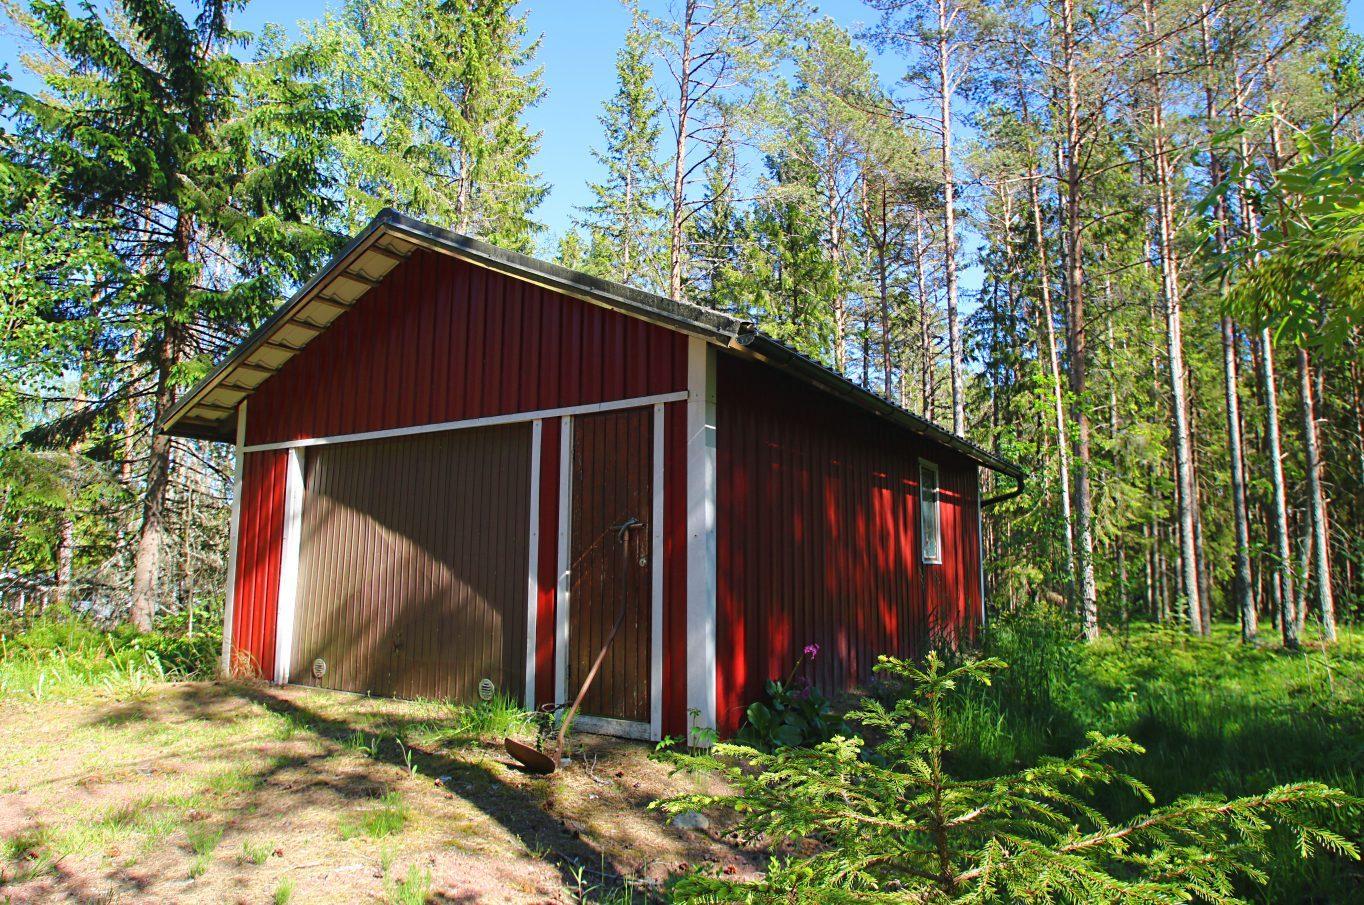 Fritidsbostad vid insjö i Vassböle, Saltvik